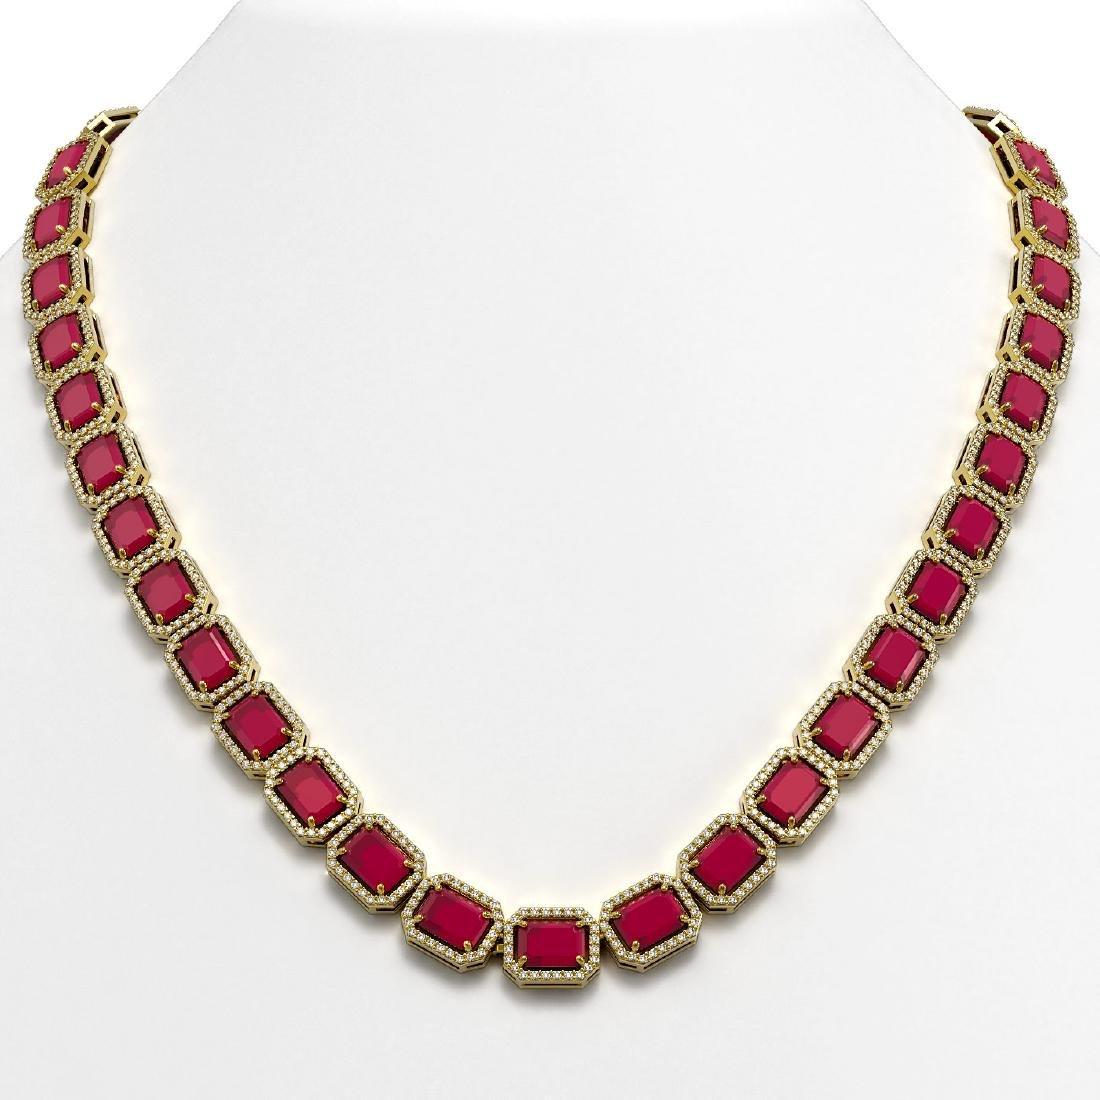 58.59 CTW Ruby & Diamond Halo Necklace 10K Yellow Gold